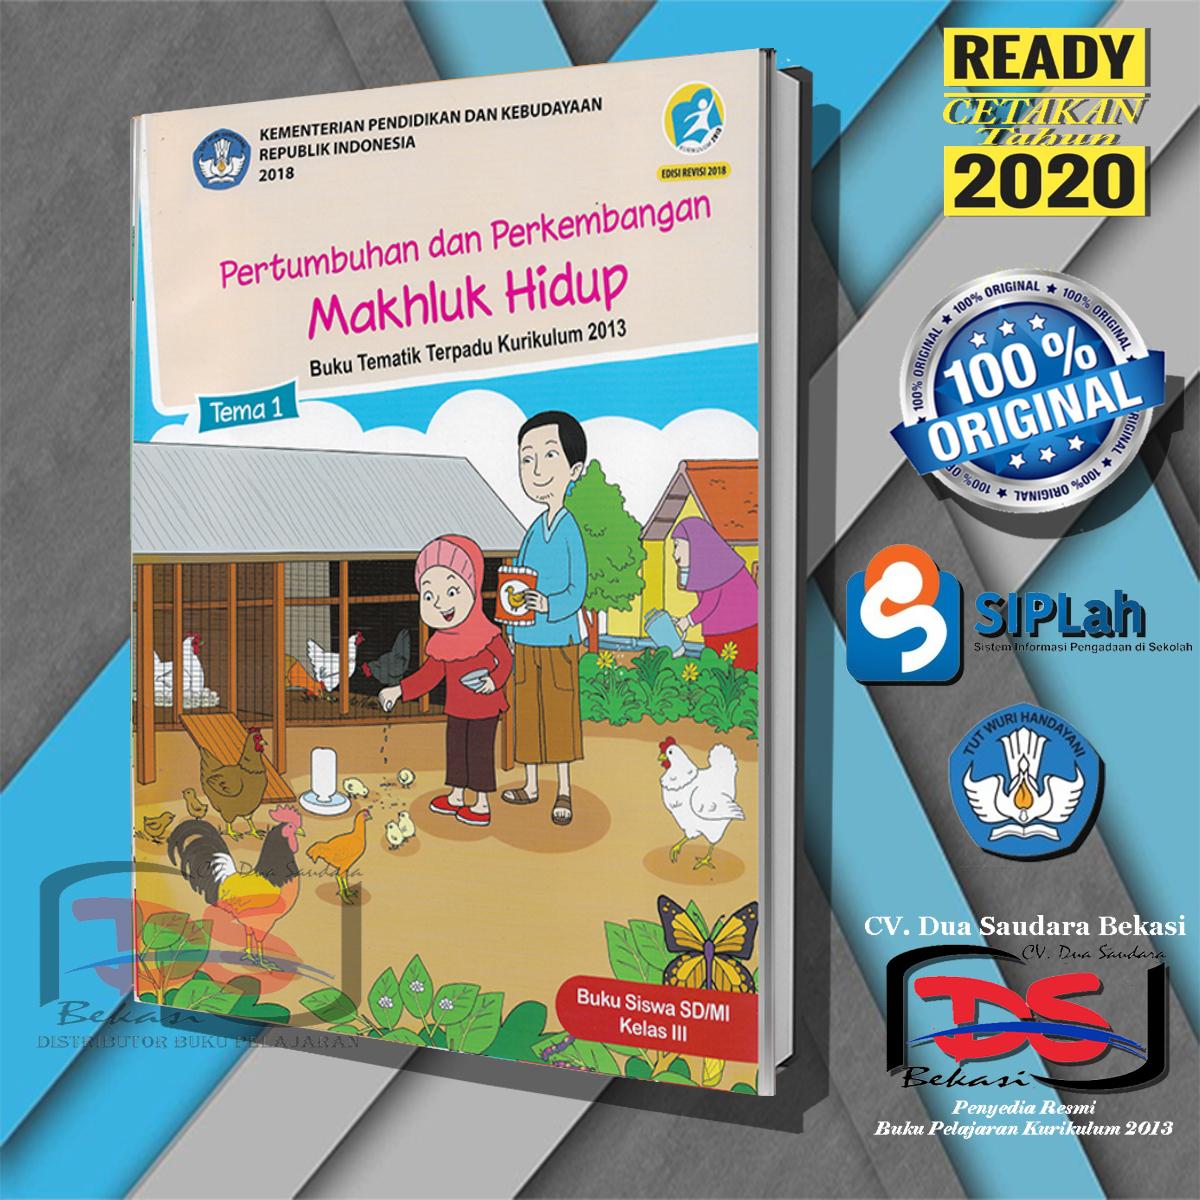 Buku Siswa Kelas 3 Sd Tema 1 Tematik Terpadu Kurikulum 2013 Revisi 2018 Lazada Indonesia